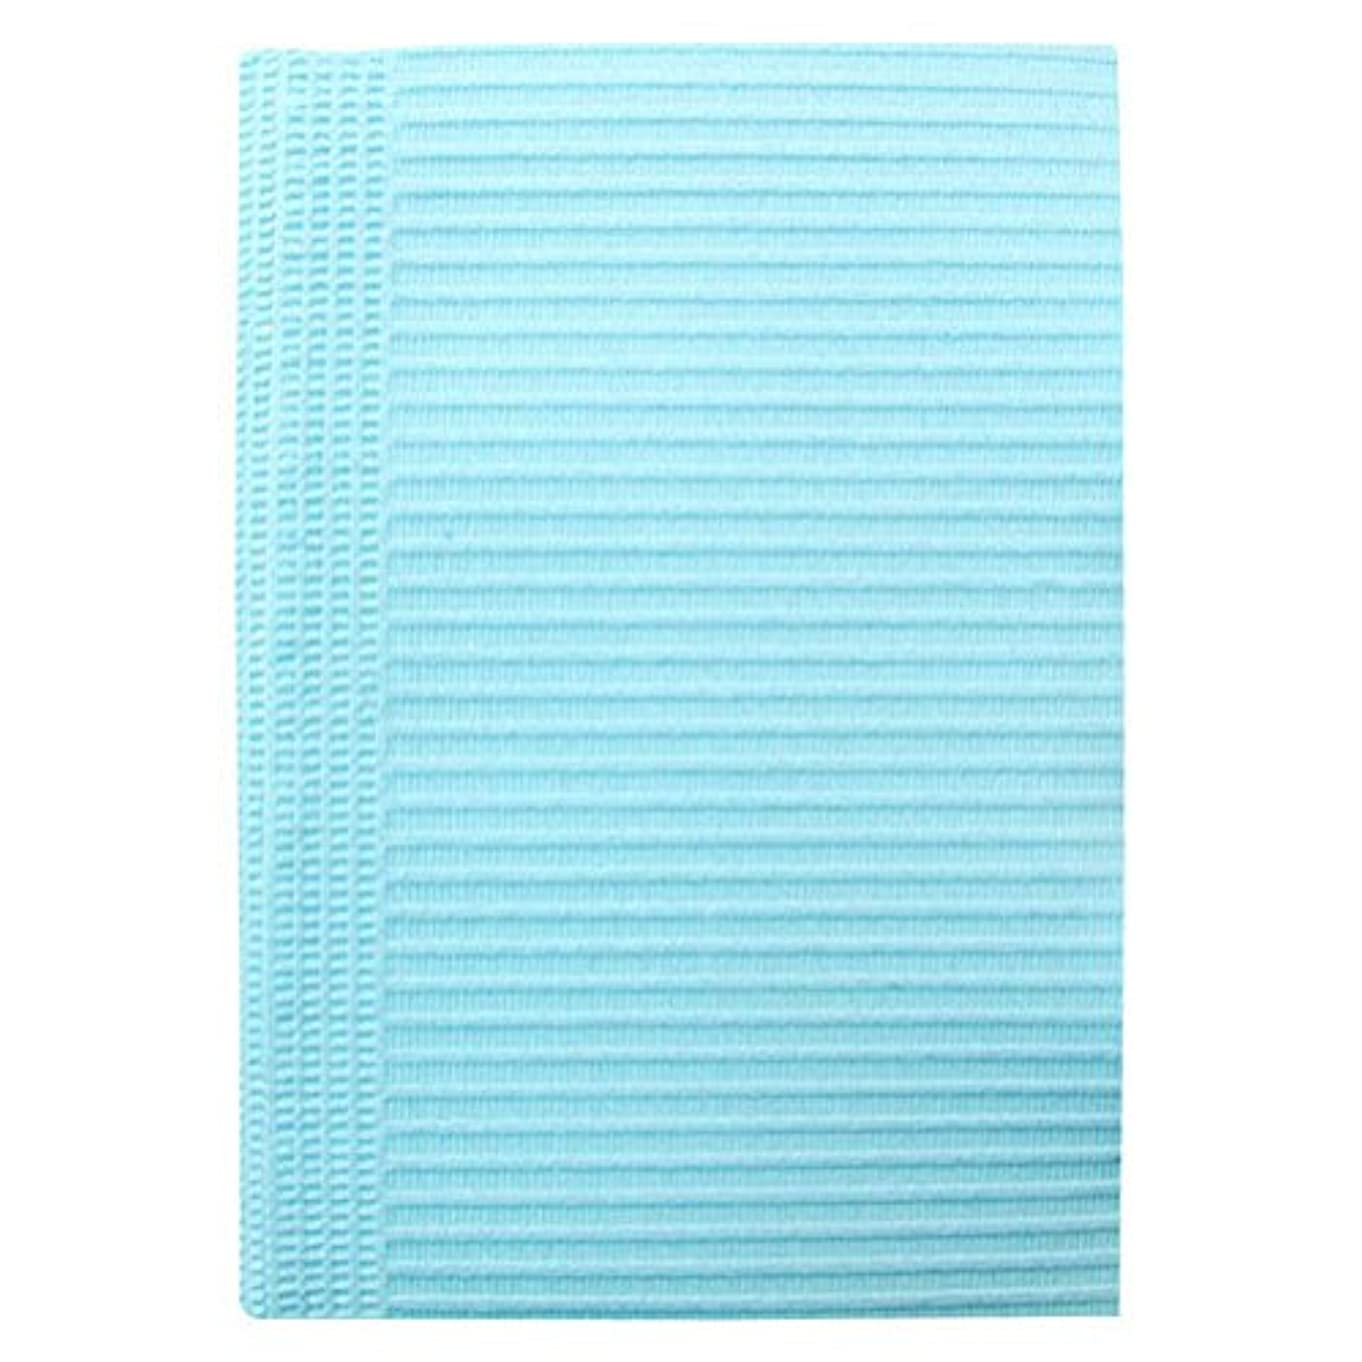 SunshineBabe サンシャインベビー ペーパーシート 50枚 ブルー